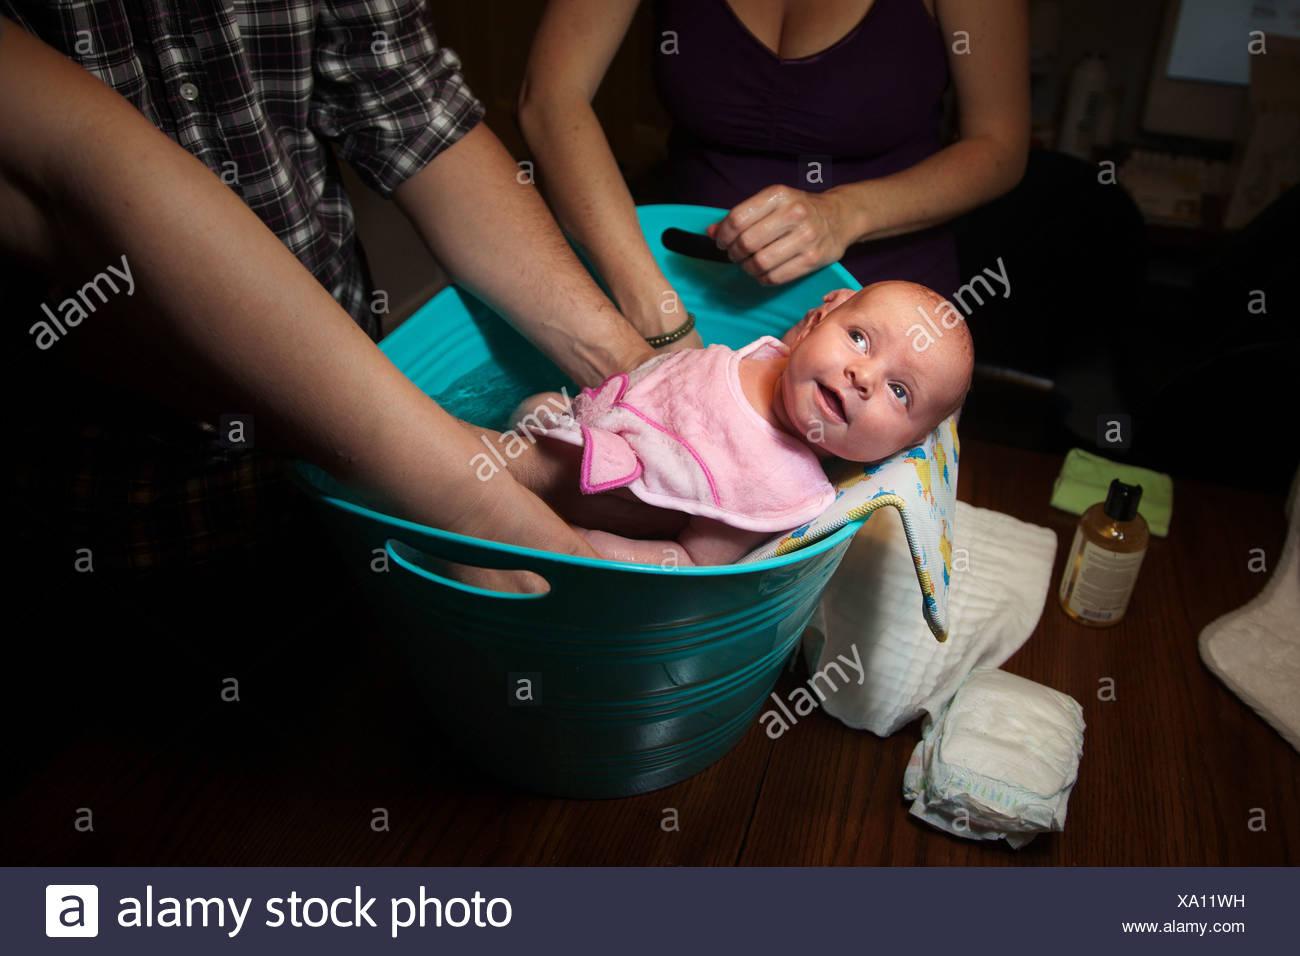 Babymädchen im Bad Stockbild